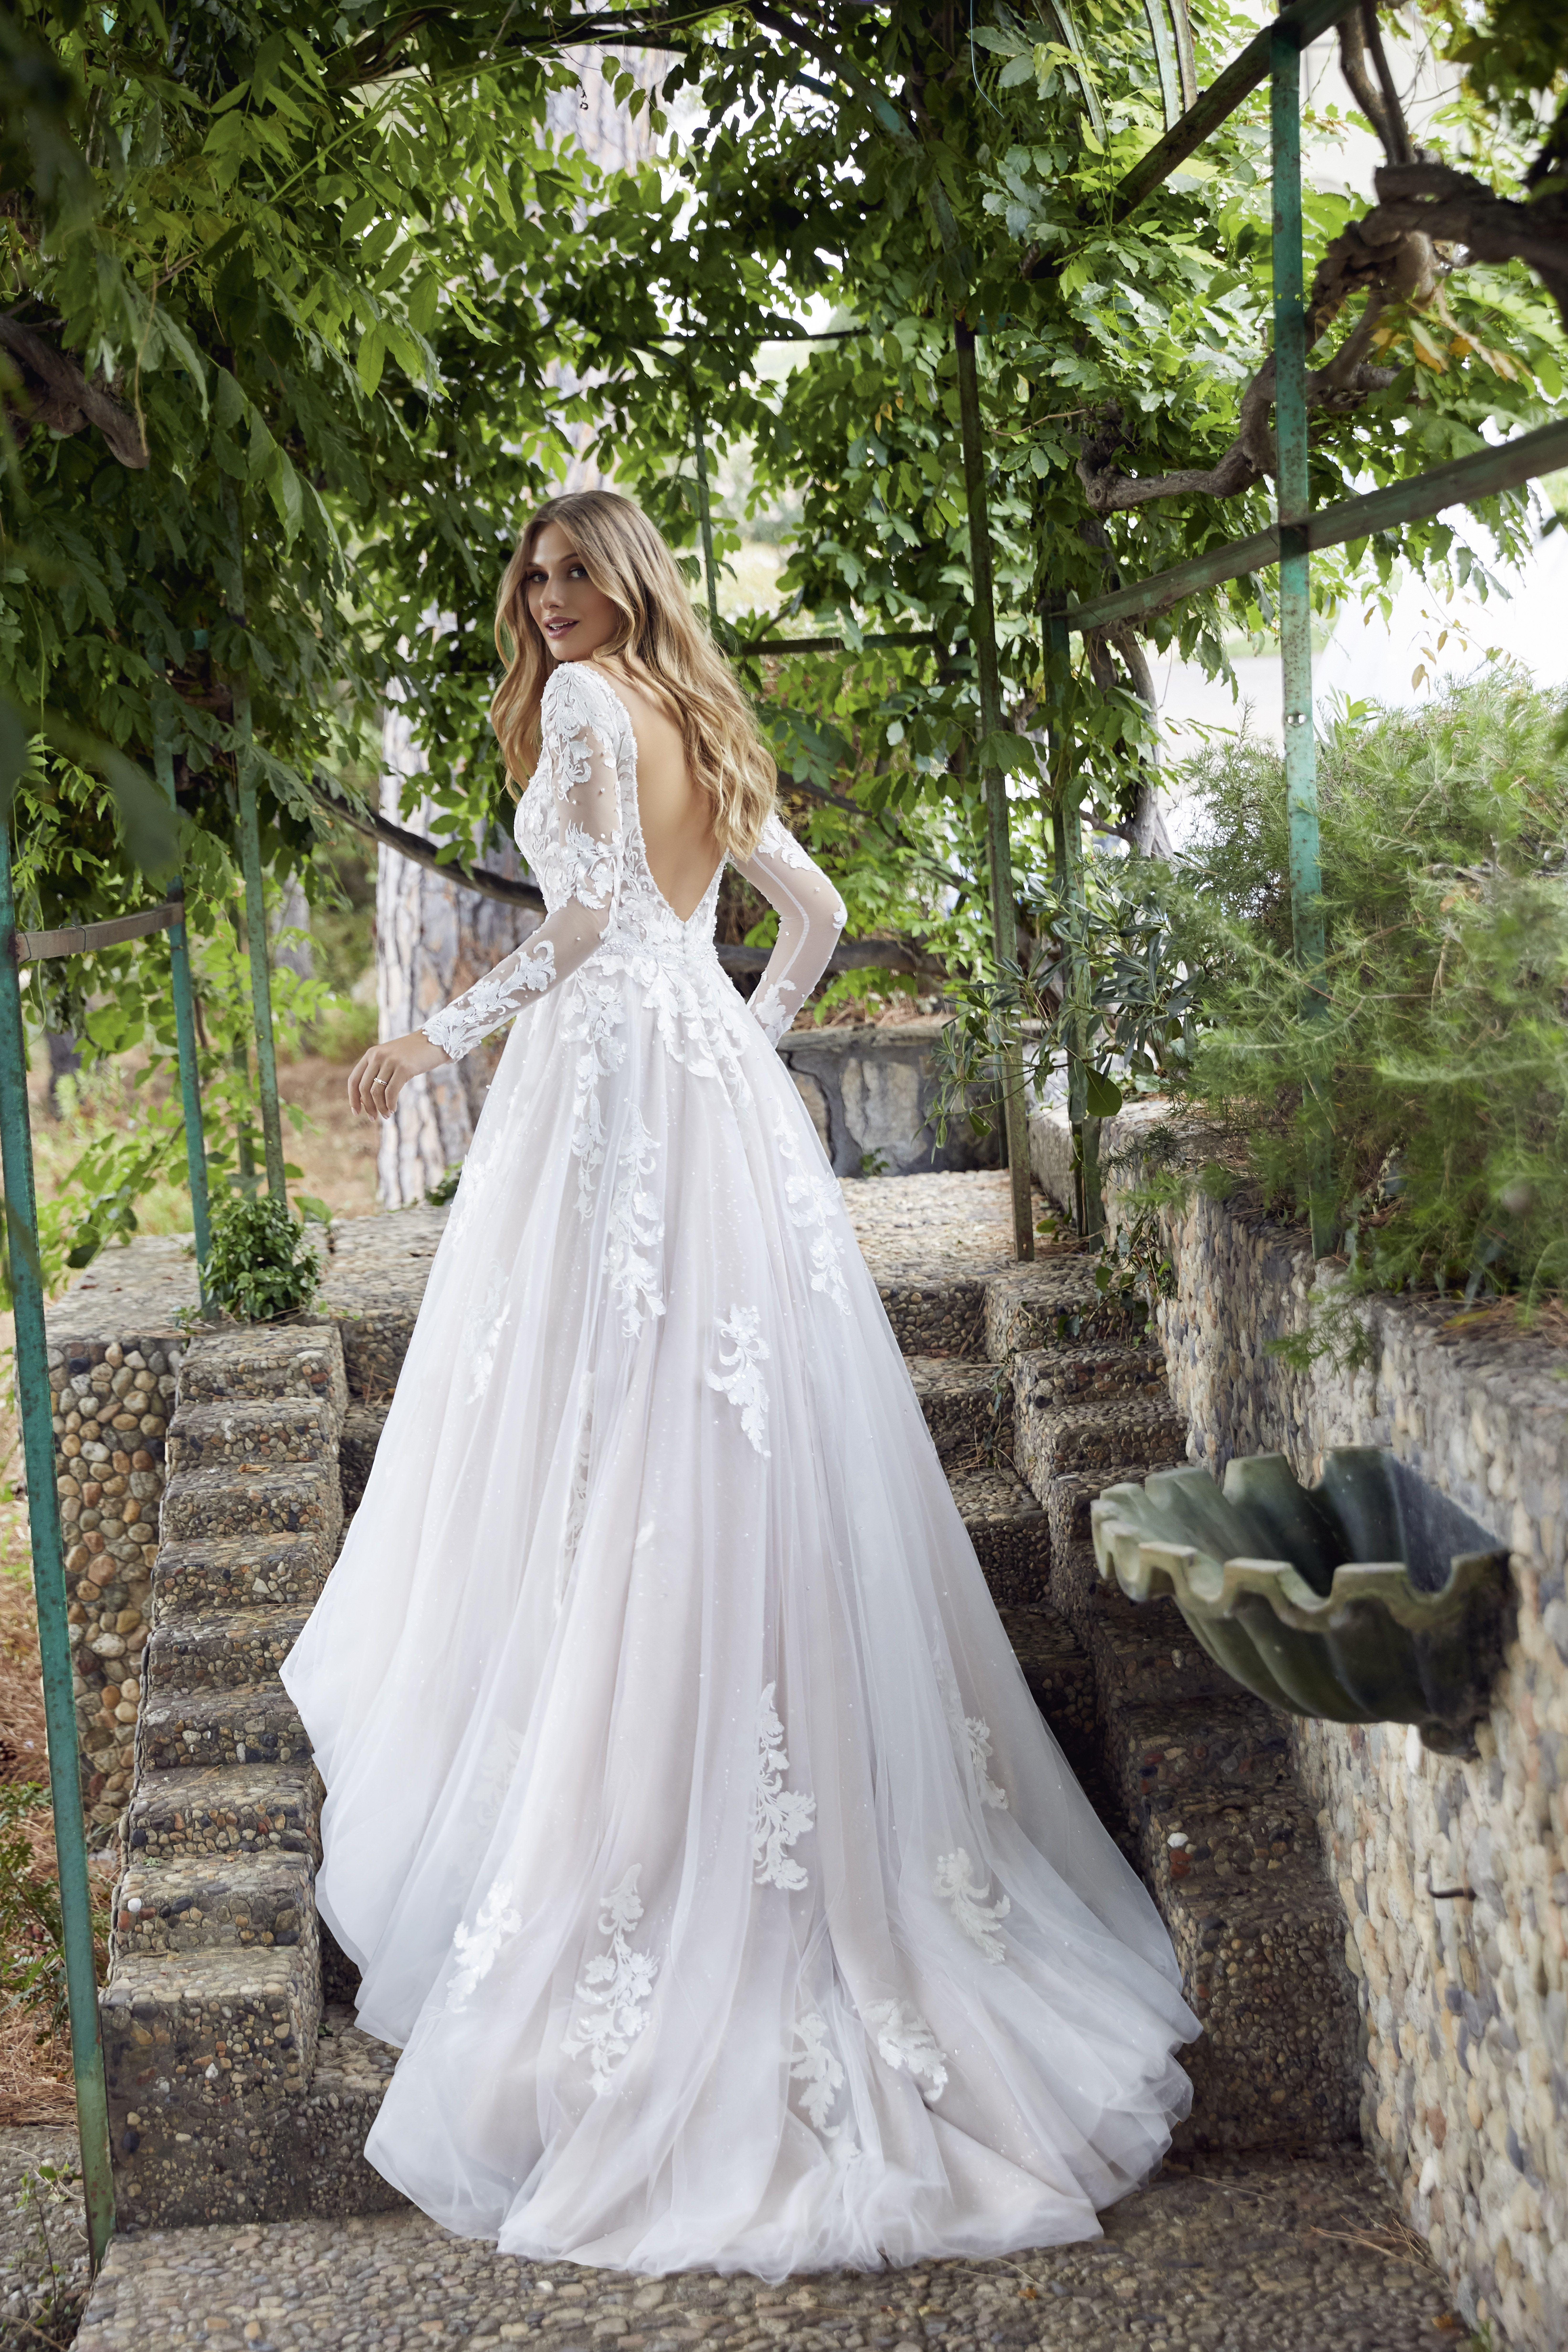 Ronald Joyce Degna Wedding Dress Spring 2020 Collection In 2020 Elegant Long Sleeve Wedding Dresses Fairy Tale Wedding Dress Ball Gowns Wedding [ 9855 x 6570 Pixel ]